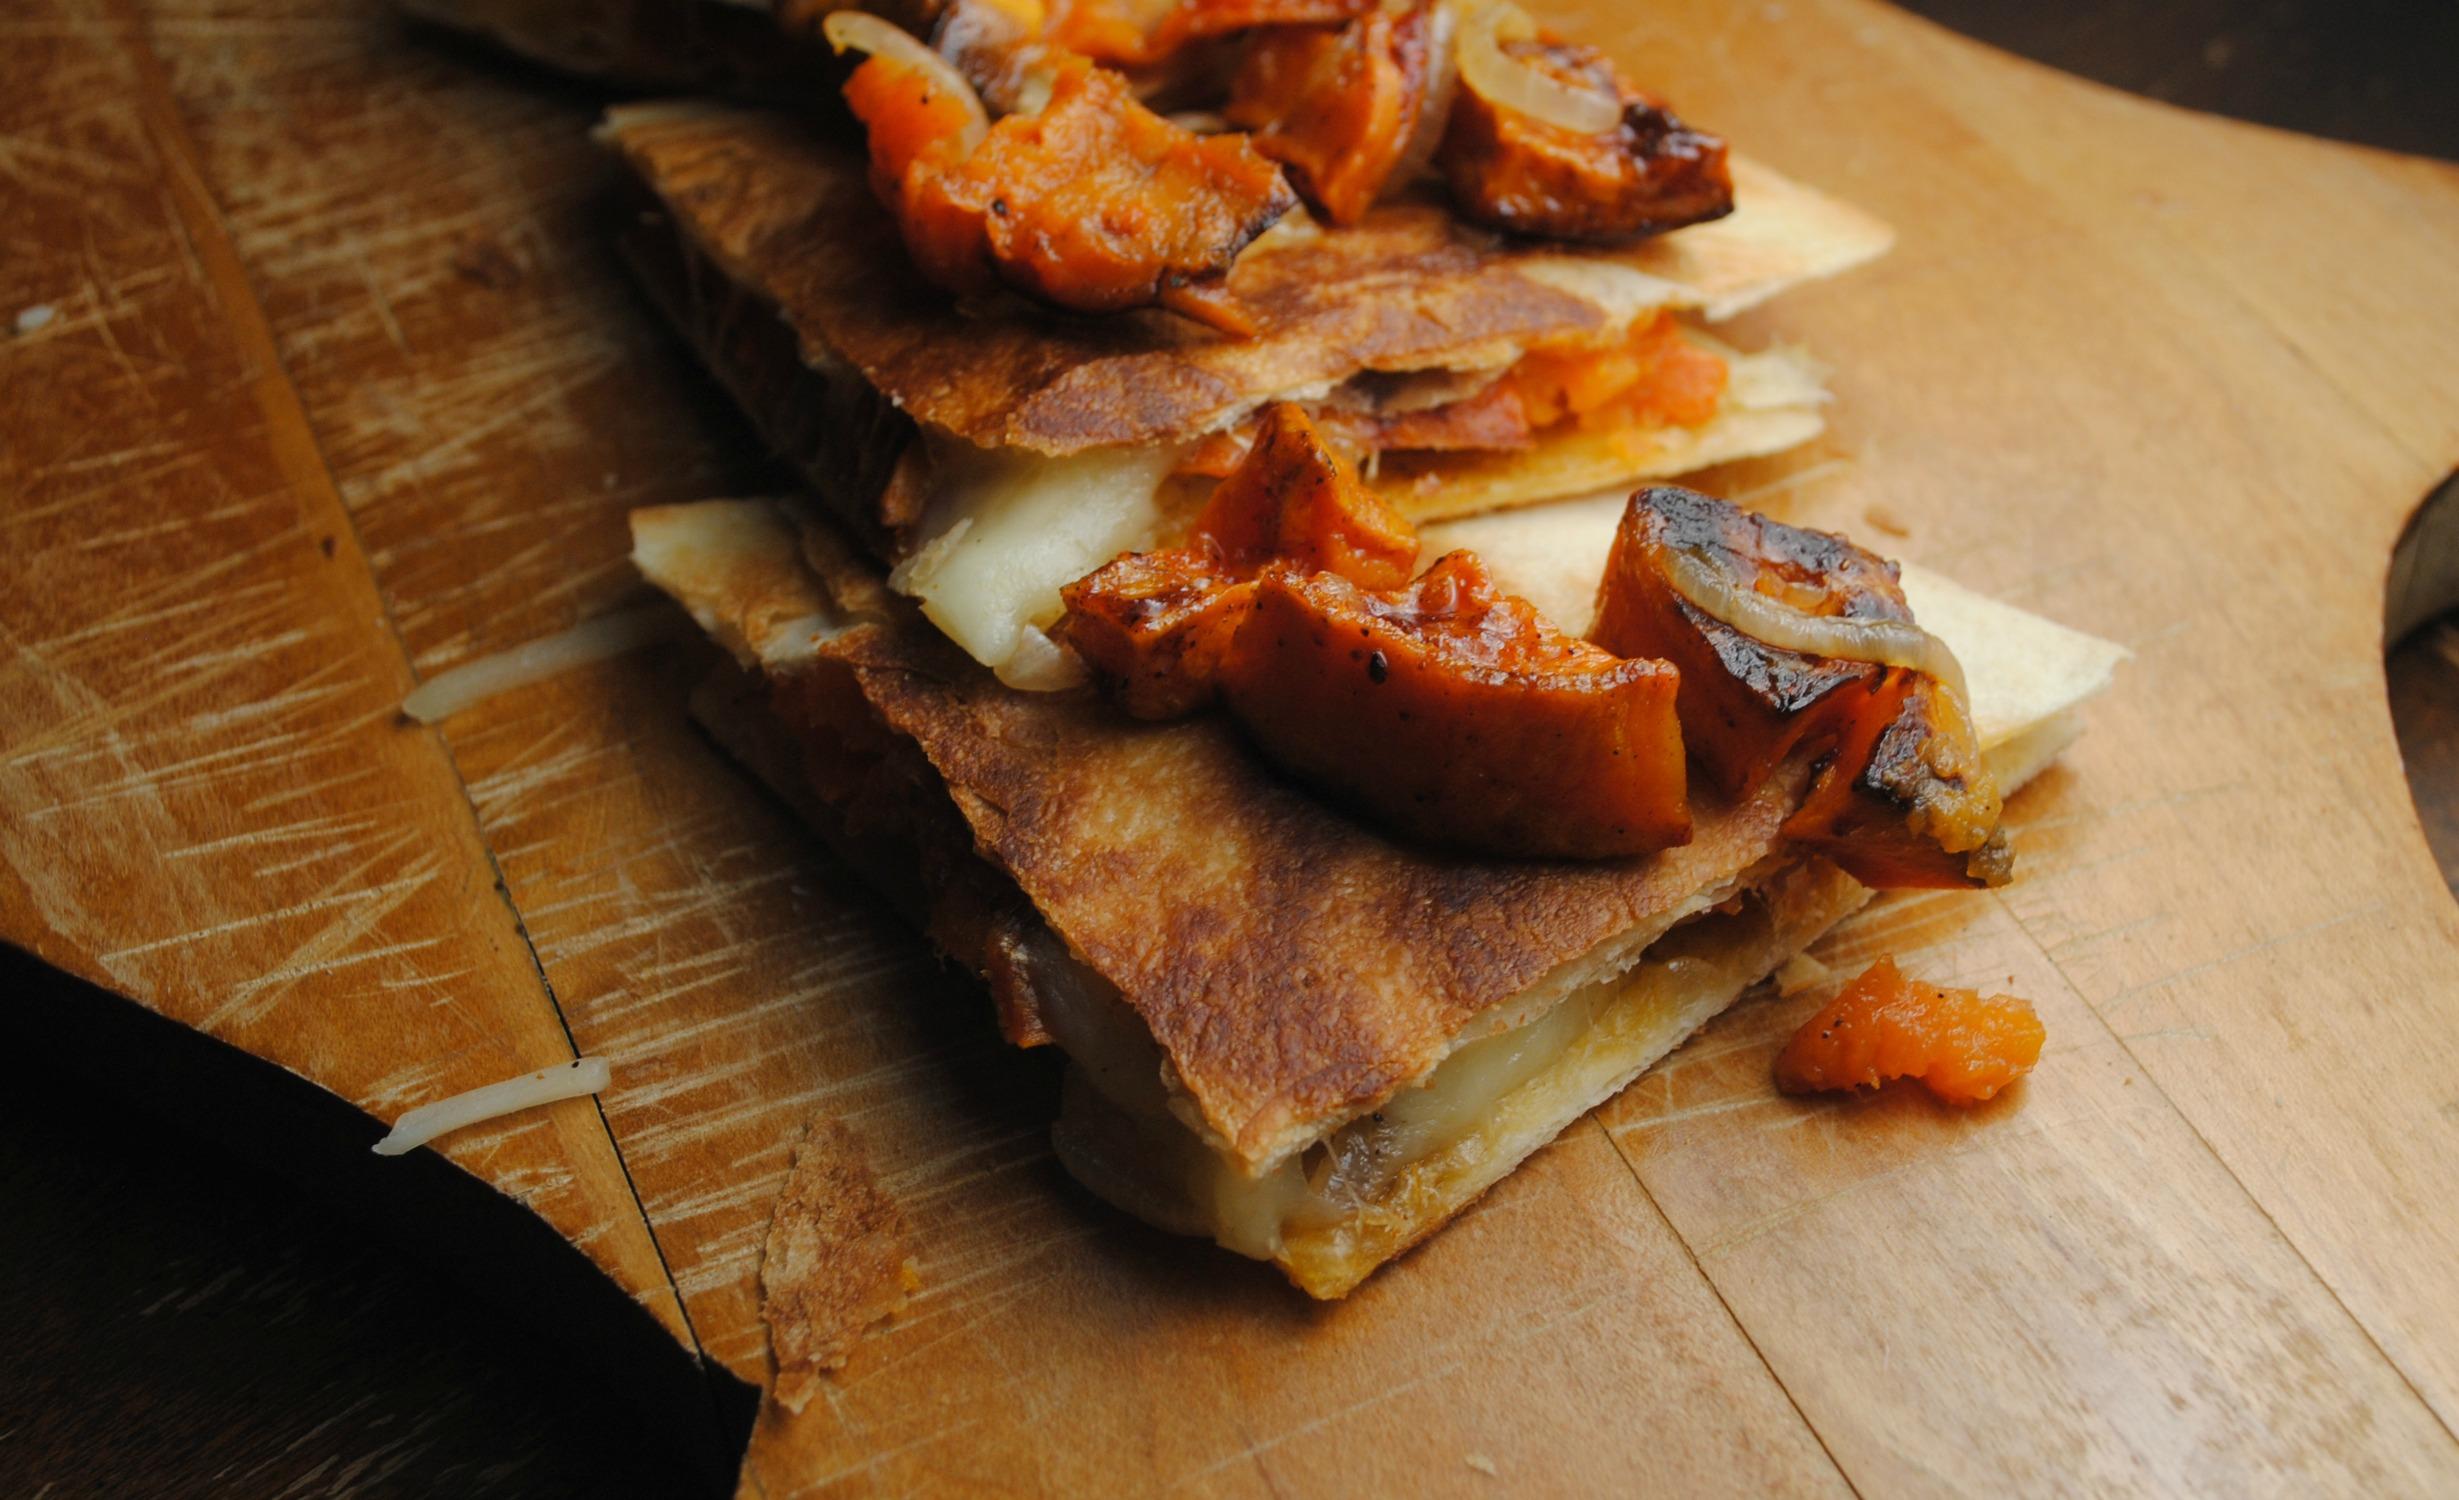 sweetpotato-quesadilla-VianneyRodriguez